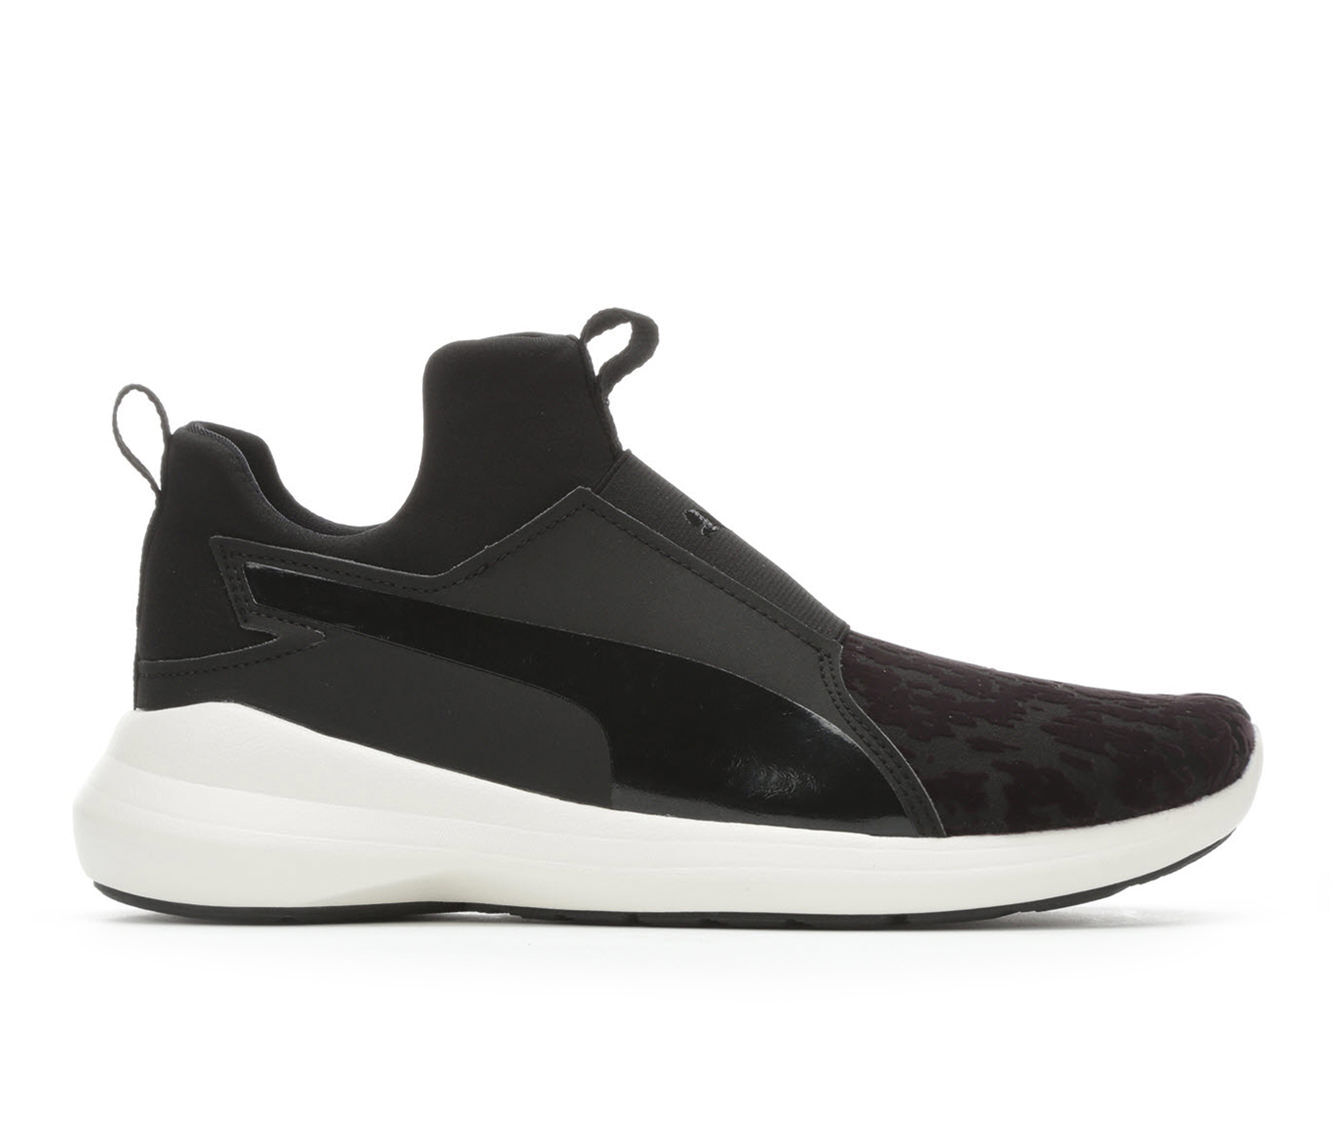 about puma shoes